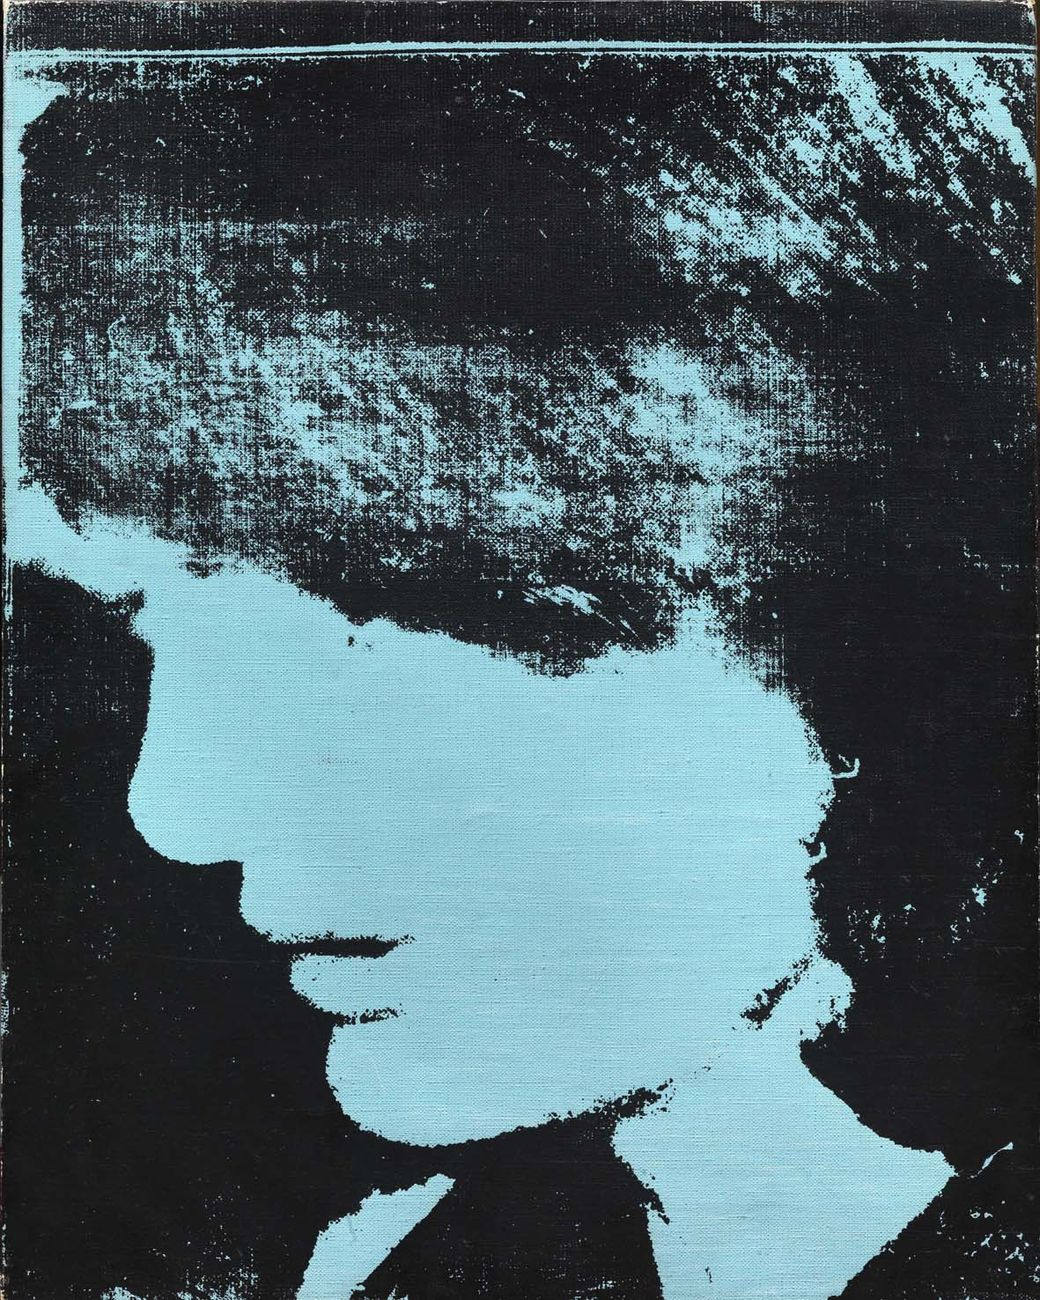 Andy Warhol, Jackie, 1964. Collezione Roberto Casamonti, Firenze